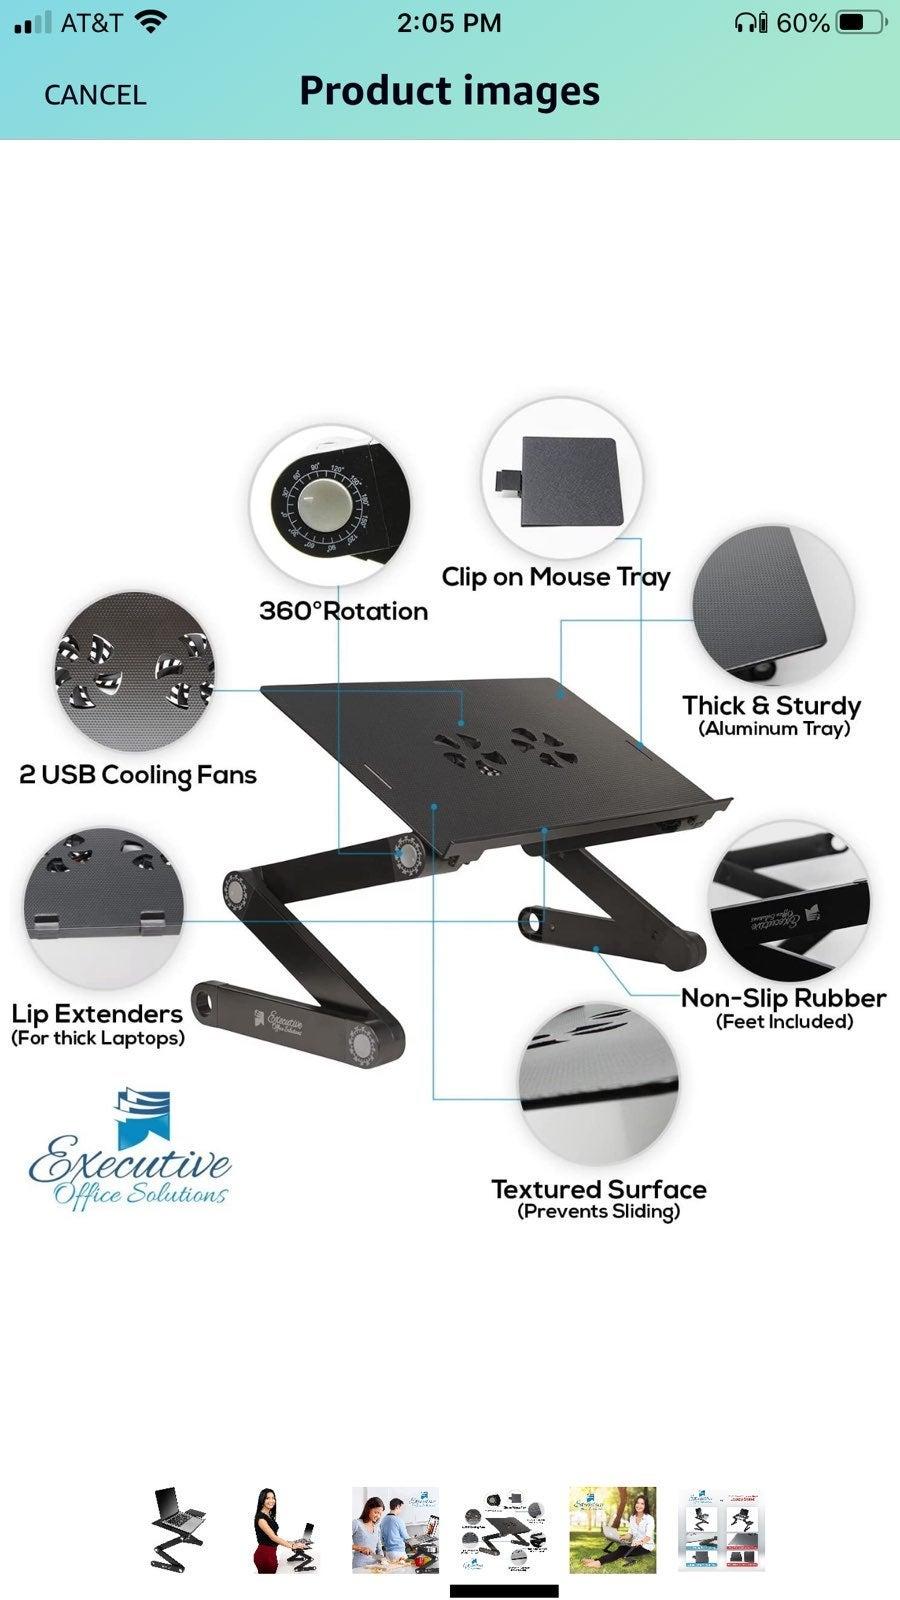 Executive Office Solutions Portable Adju